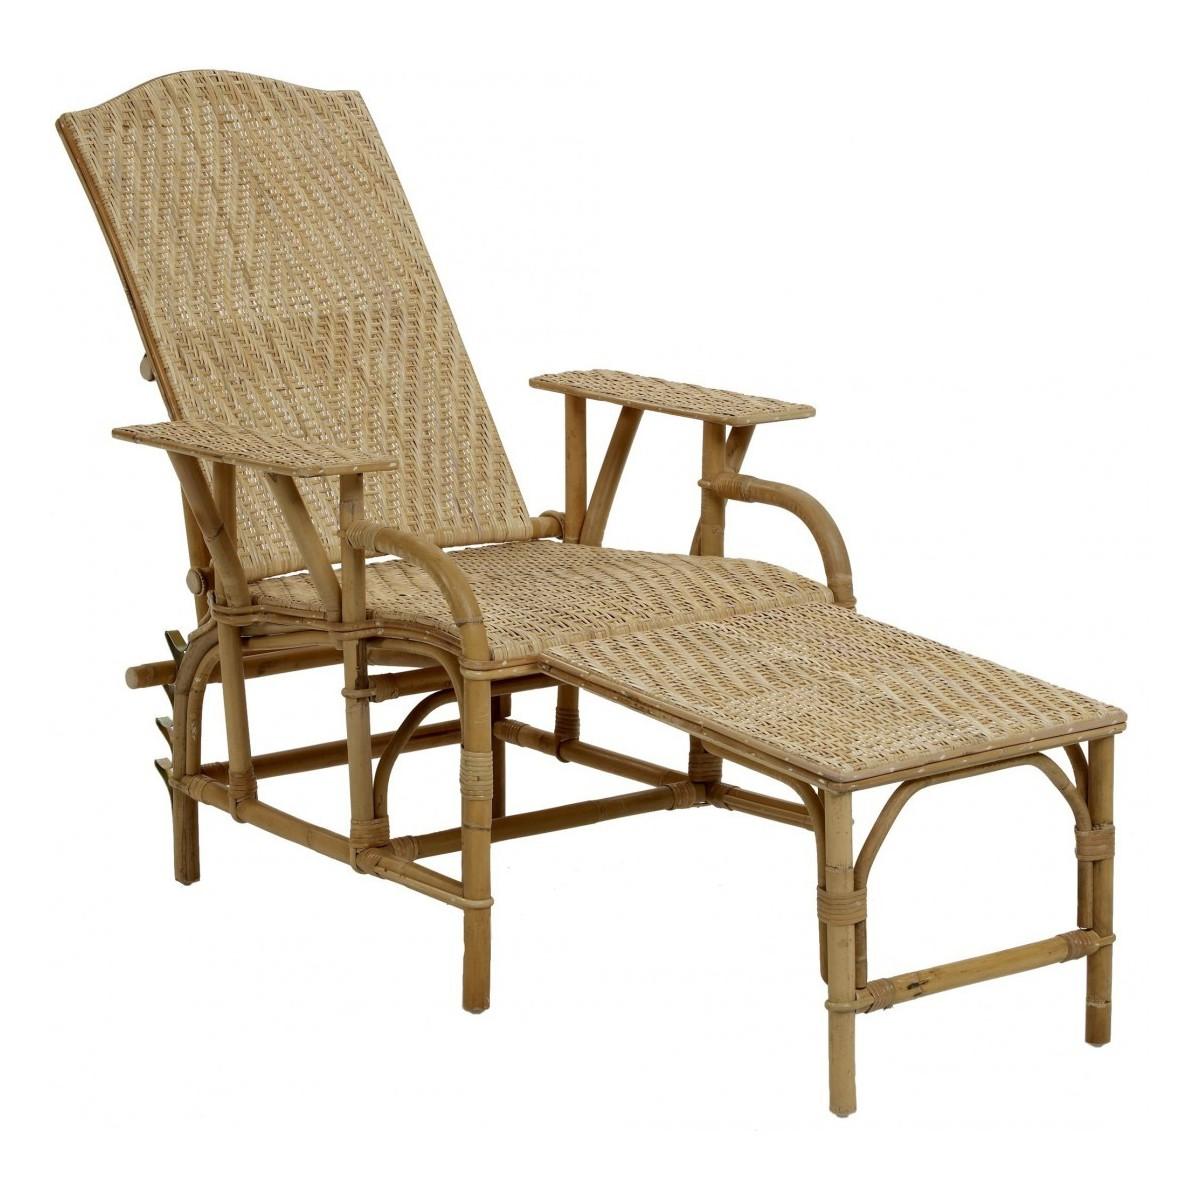 chaise longue en rotin naturel. Black Bedroom Furniture Sets. Home Design Ideas